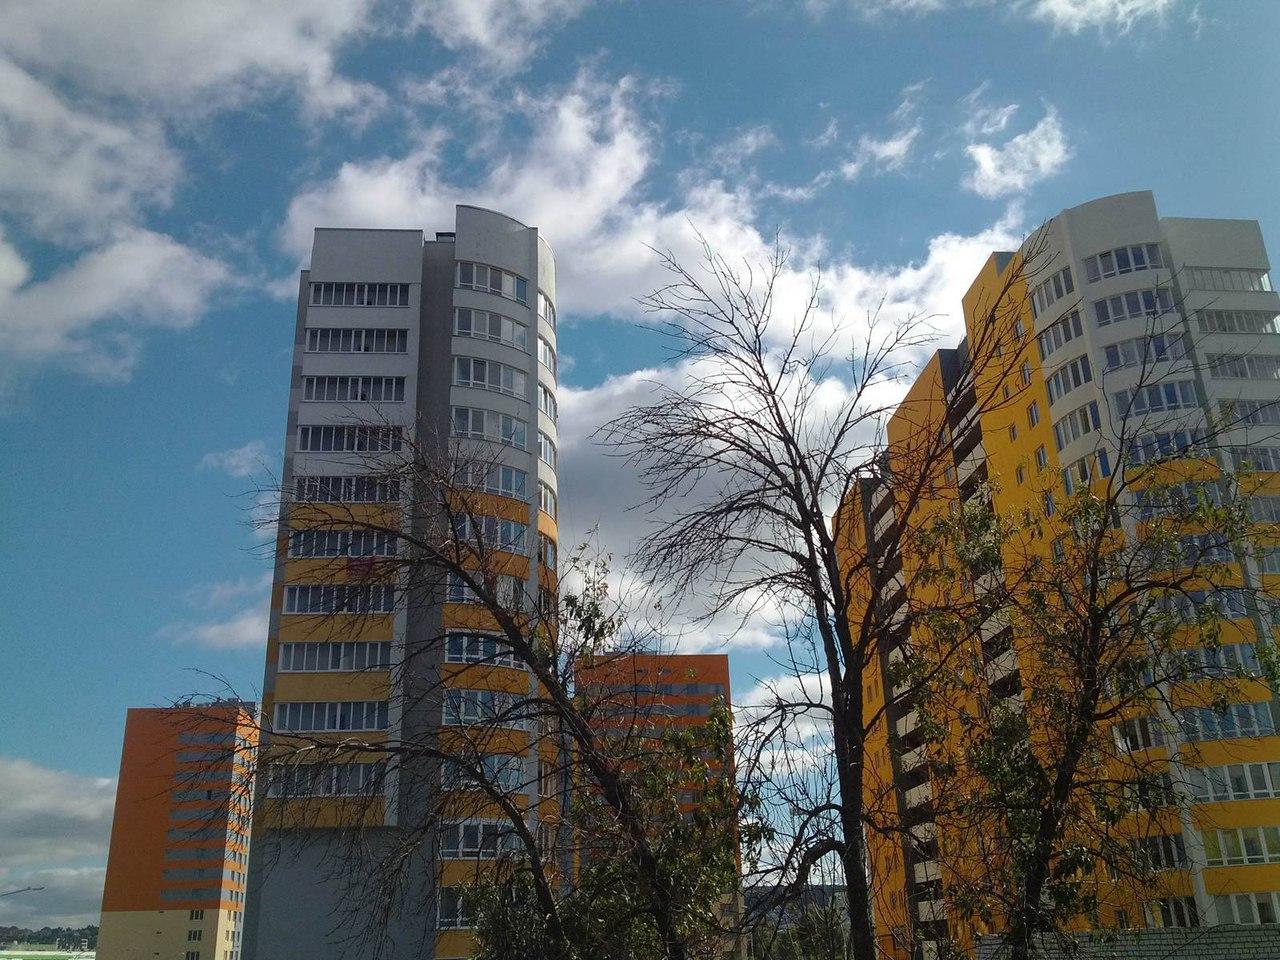 Продажа квартир в новостройках в Арбеково